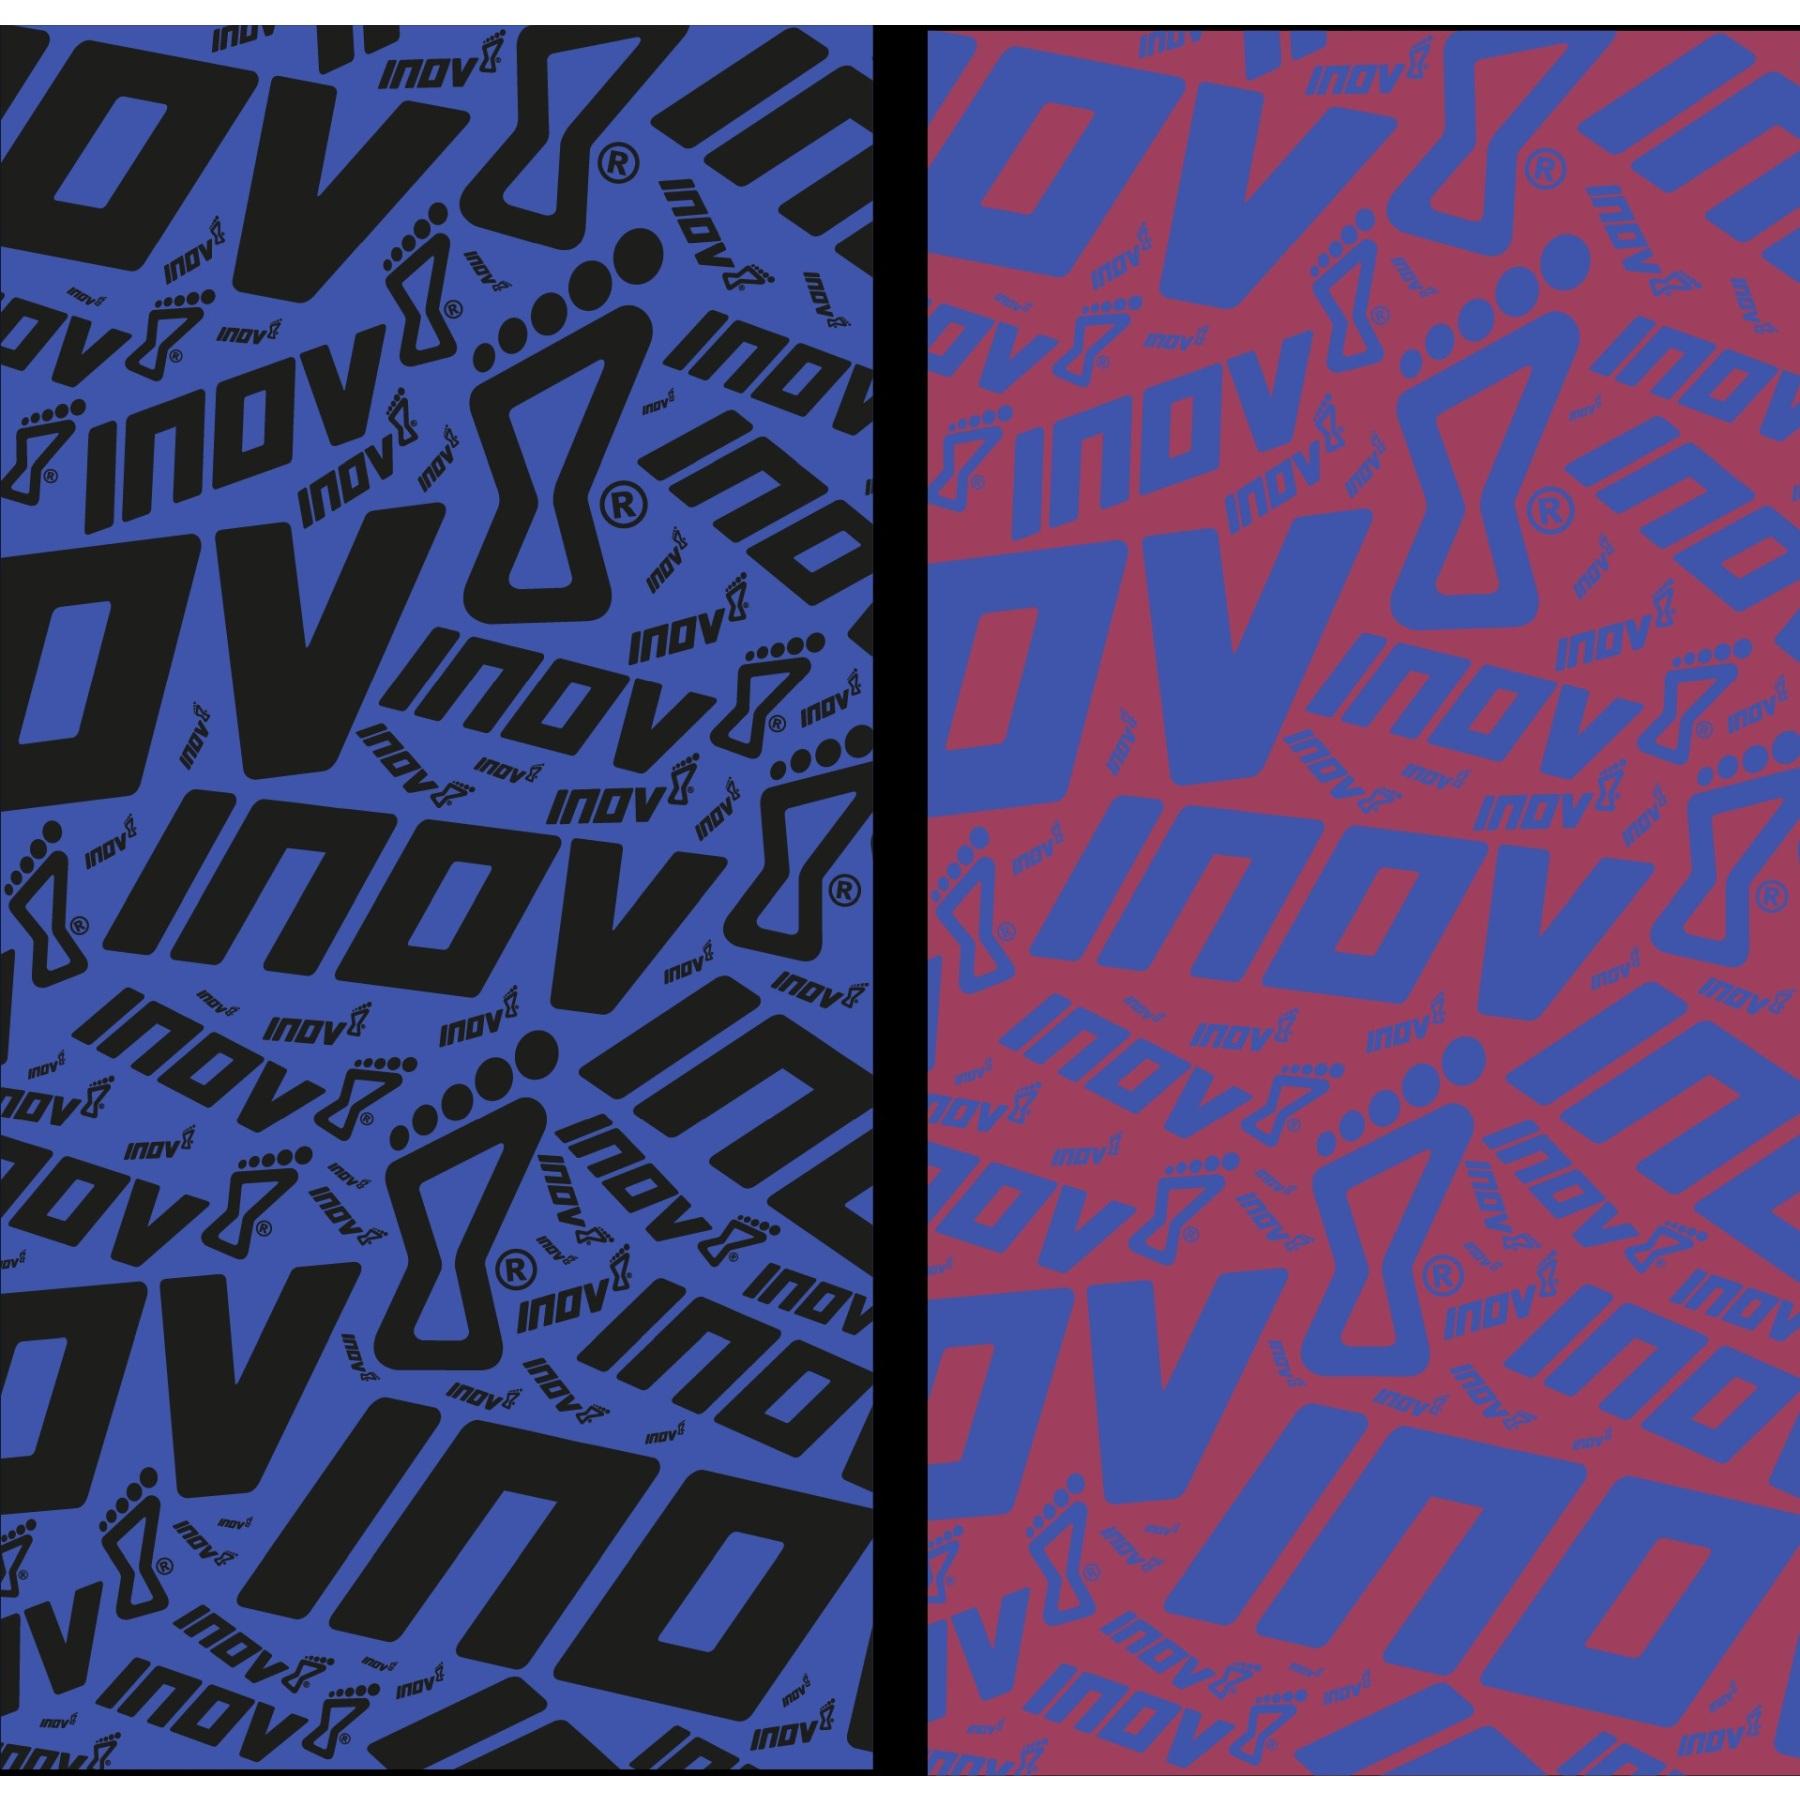 Inov-8 Wrag Multifunctional Cloth (Pair) - blue/black pink/blue